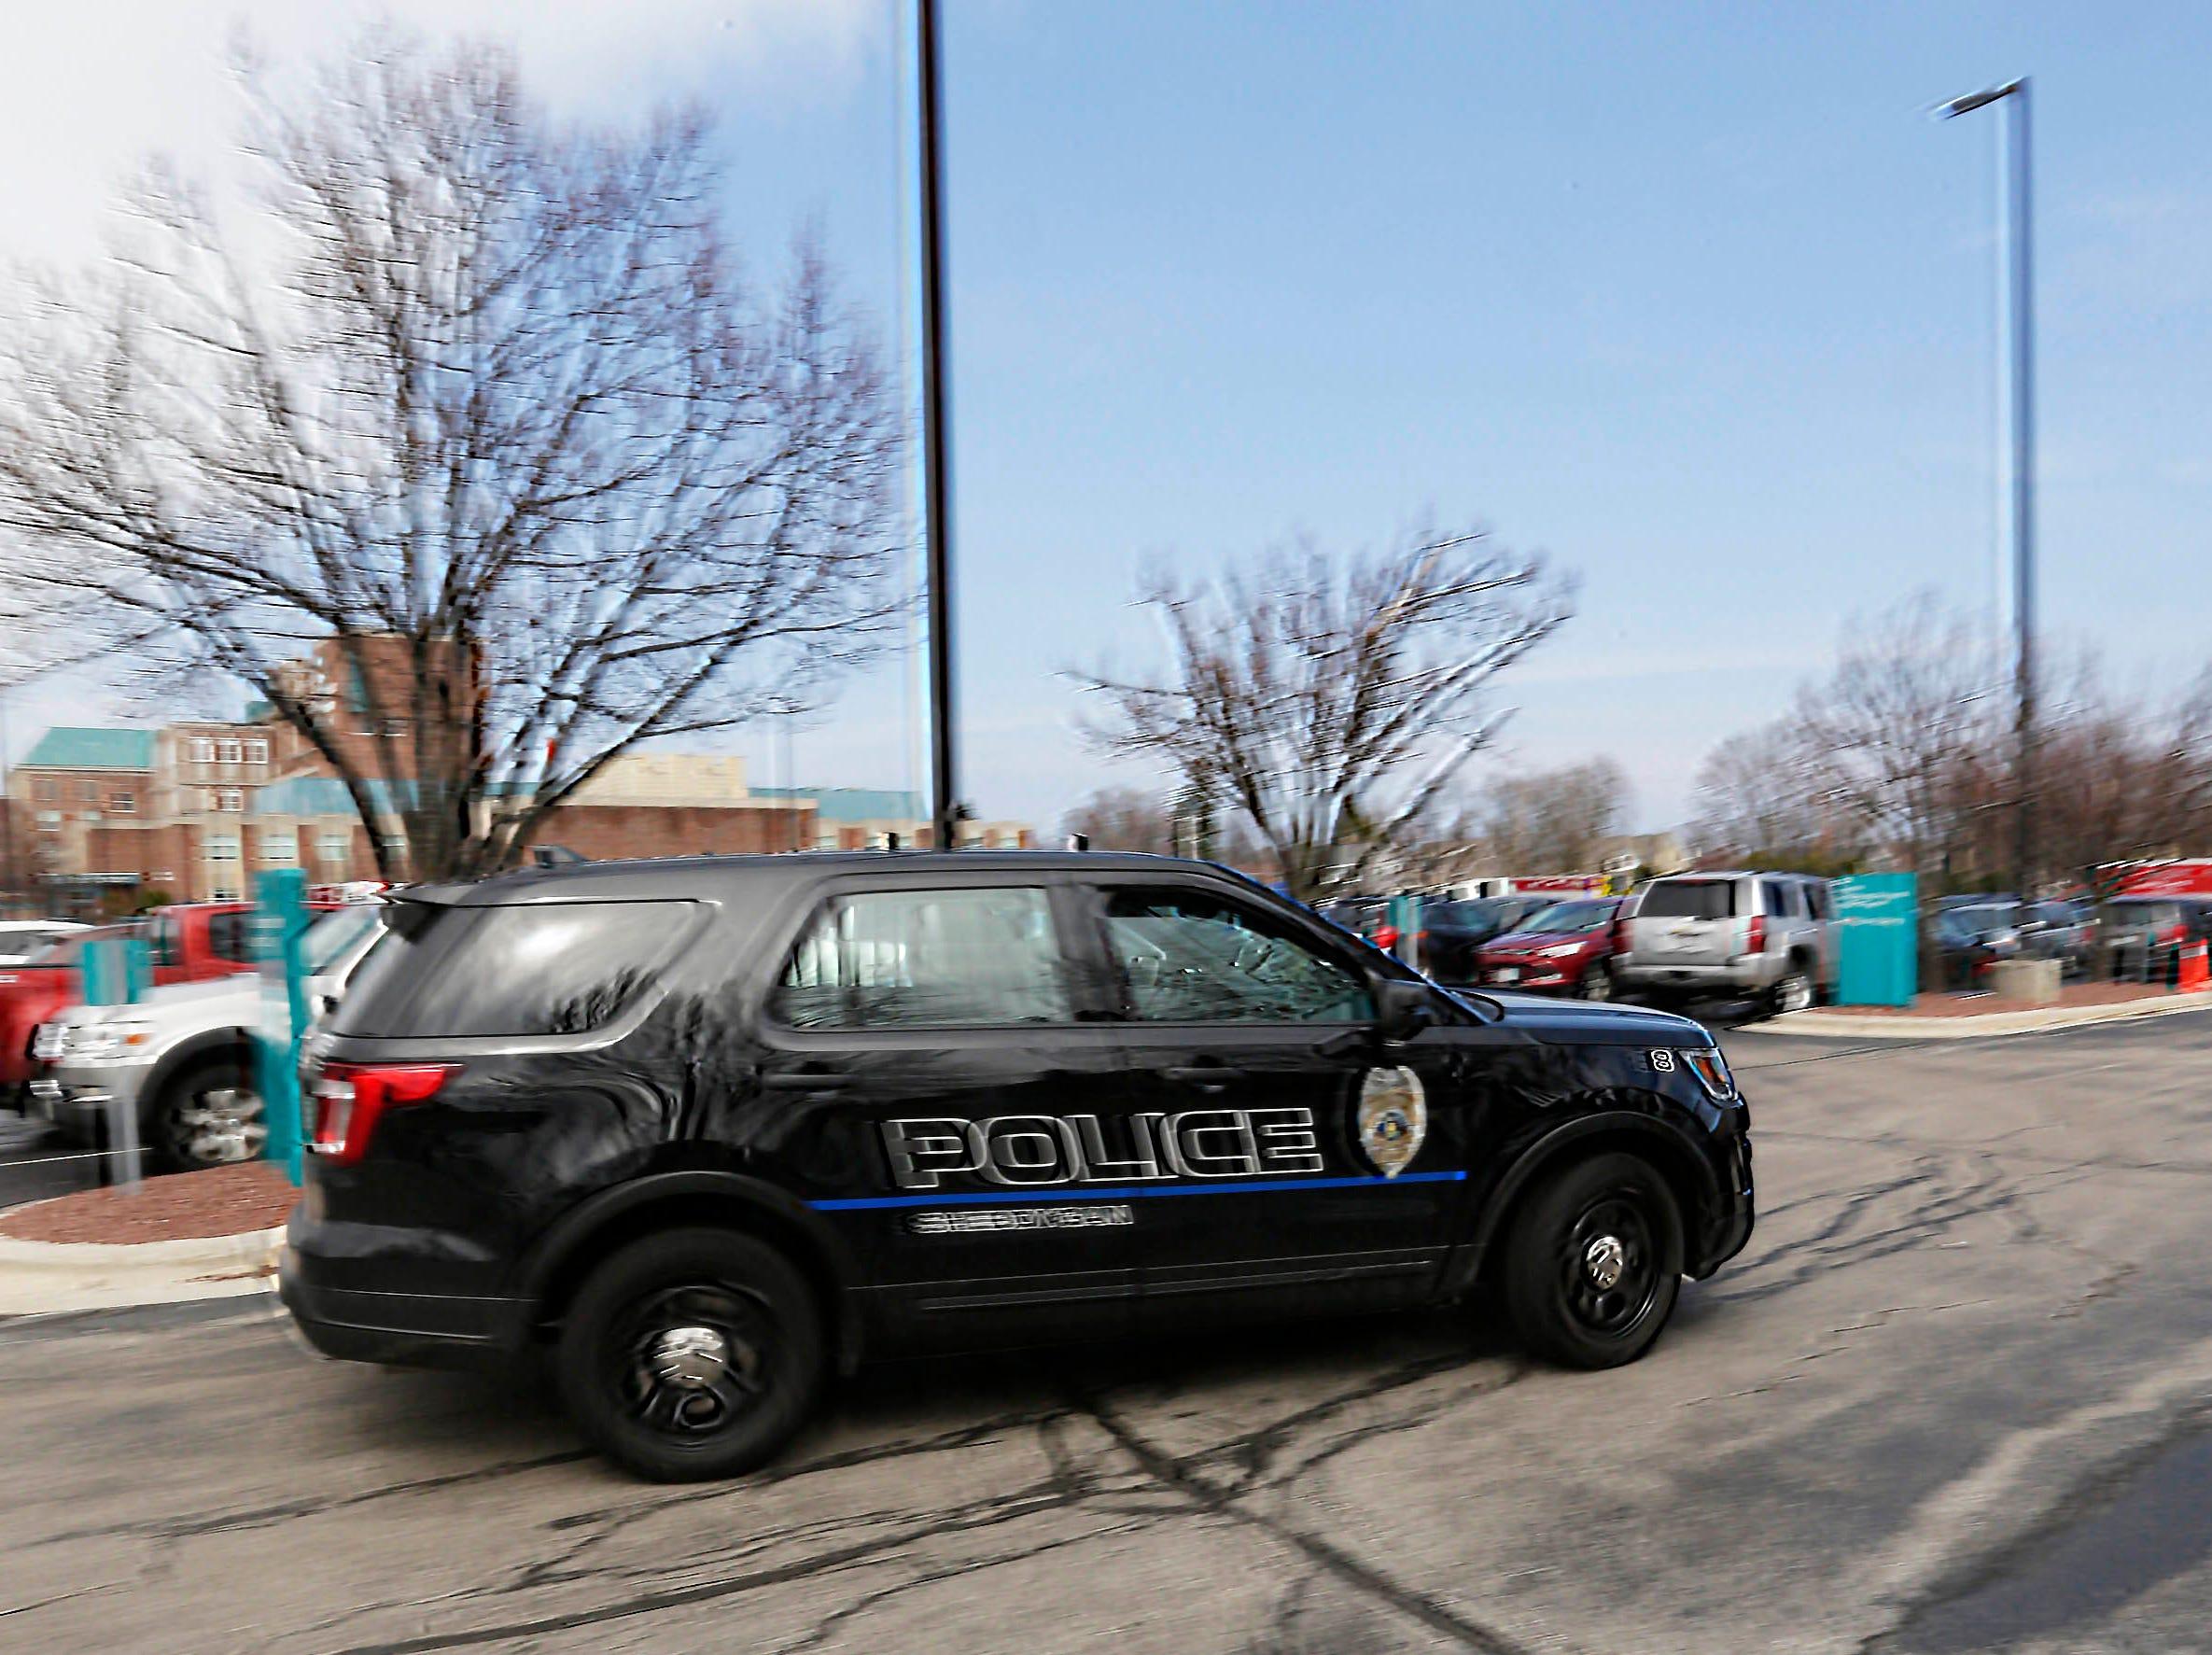 DRILL EXERCISE:  A Sheboygan Police car  drives to park at the training exercise for Sheboygan area emergency agencies, Tuesday, April 16, 2019, in Sheboygan, Wis.